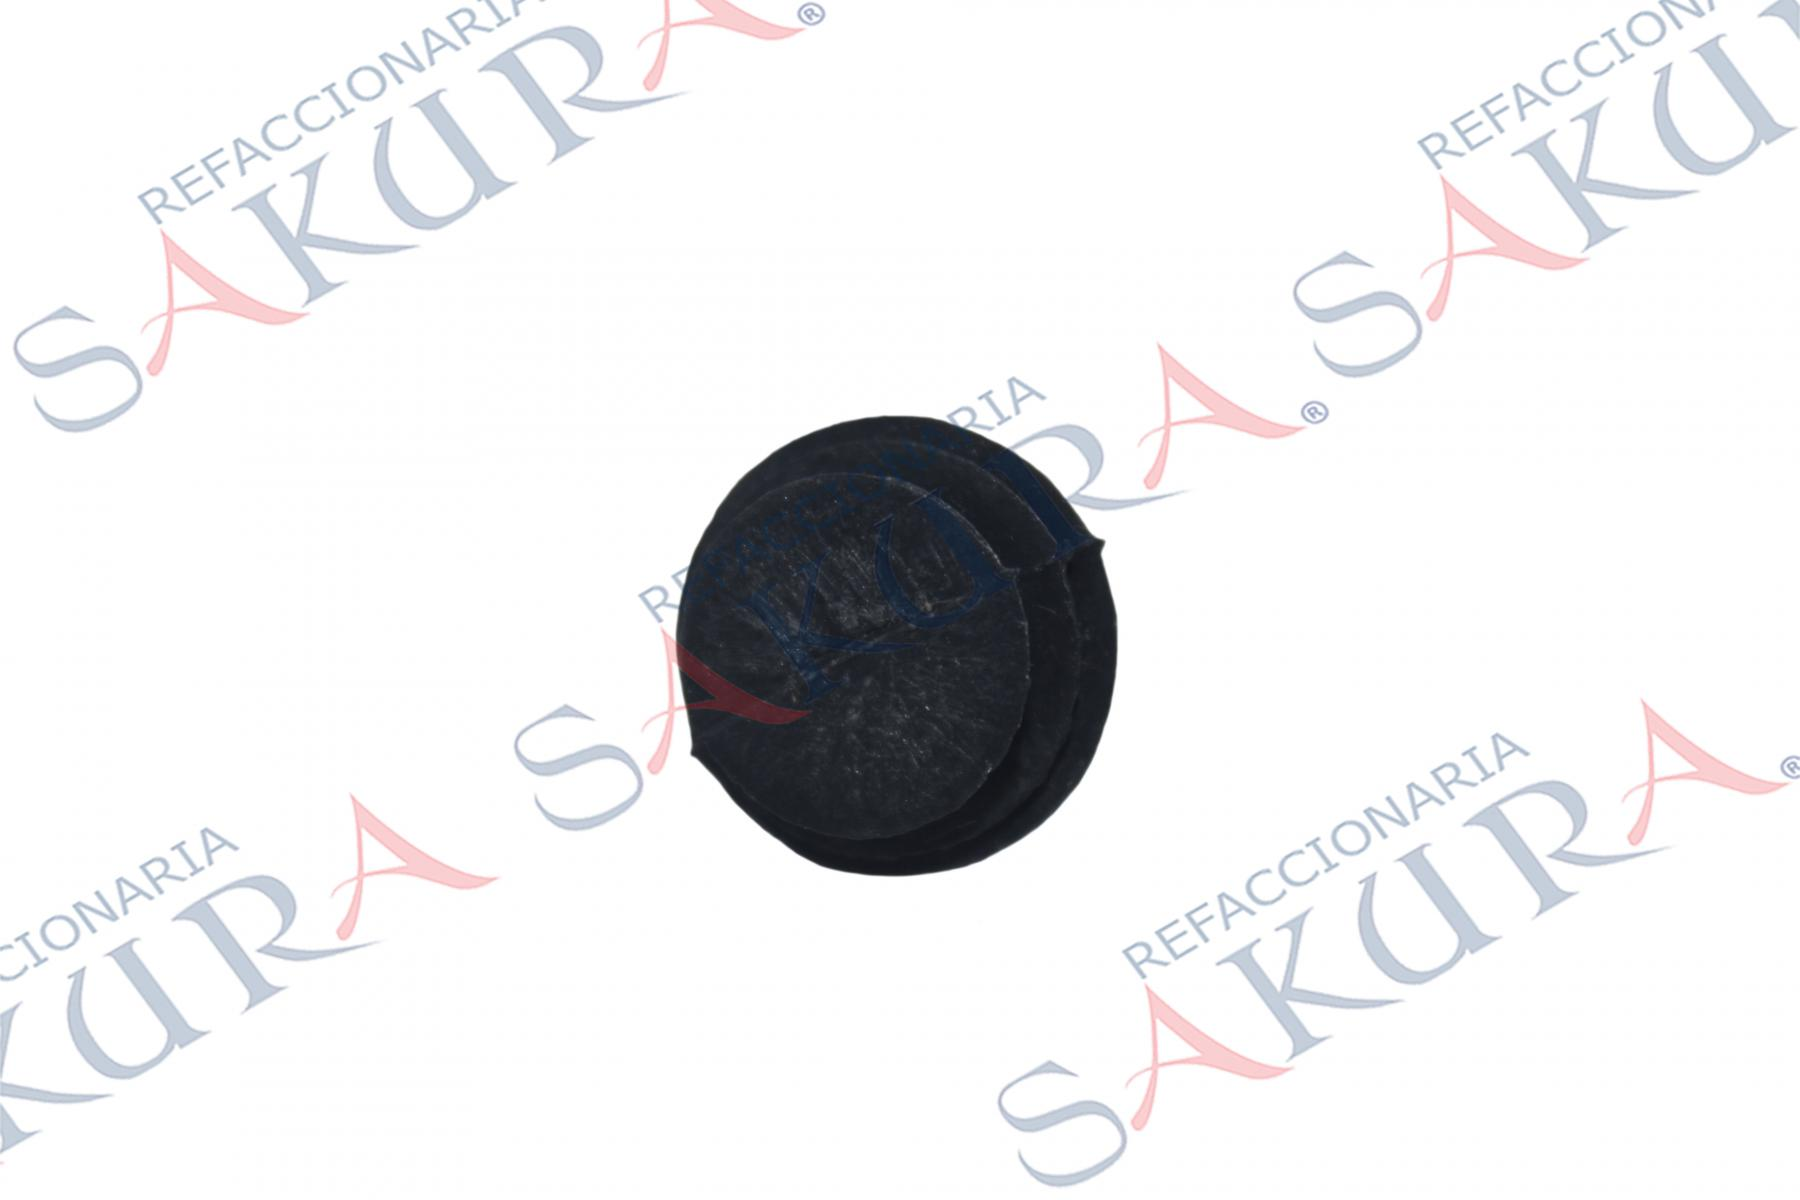 070, Grapa Doble Cabeza  (Facrochip)